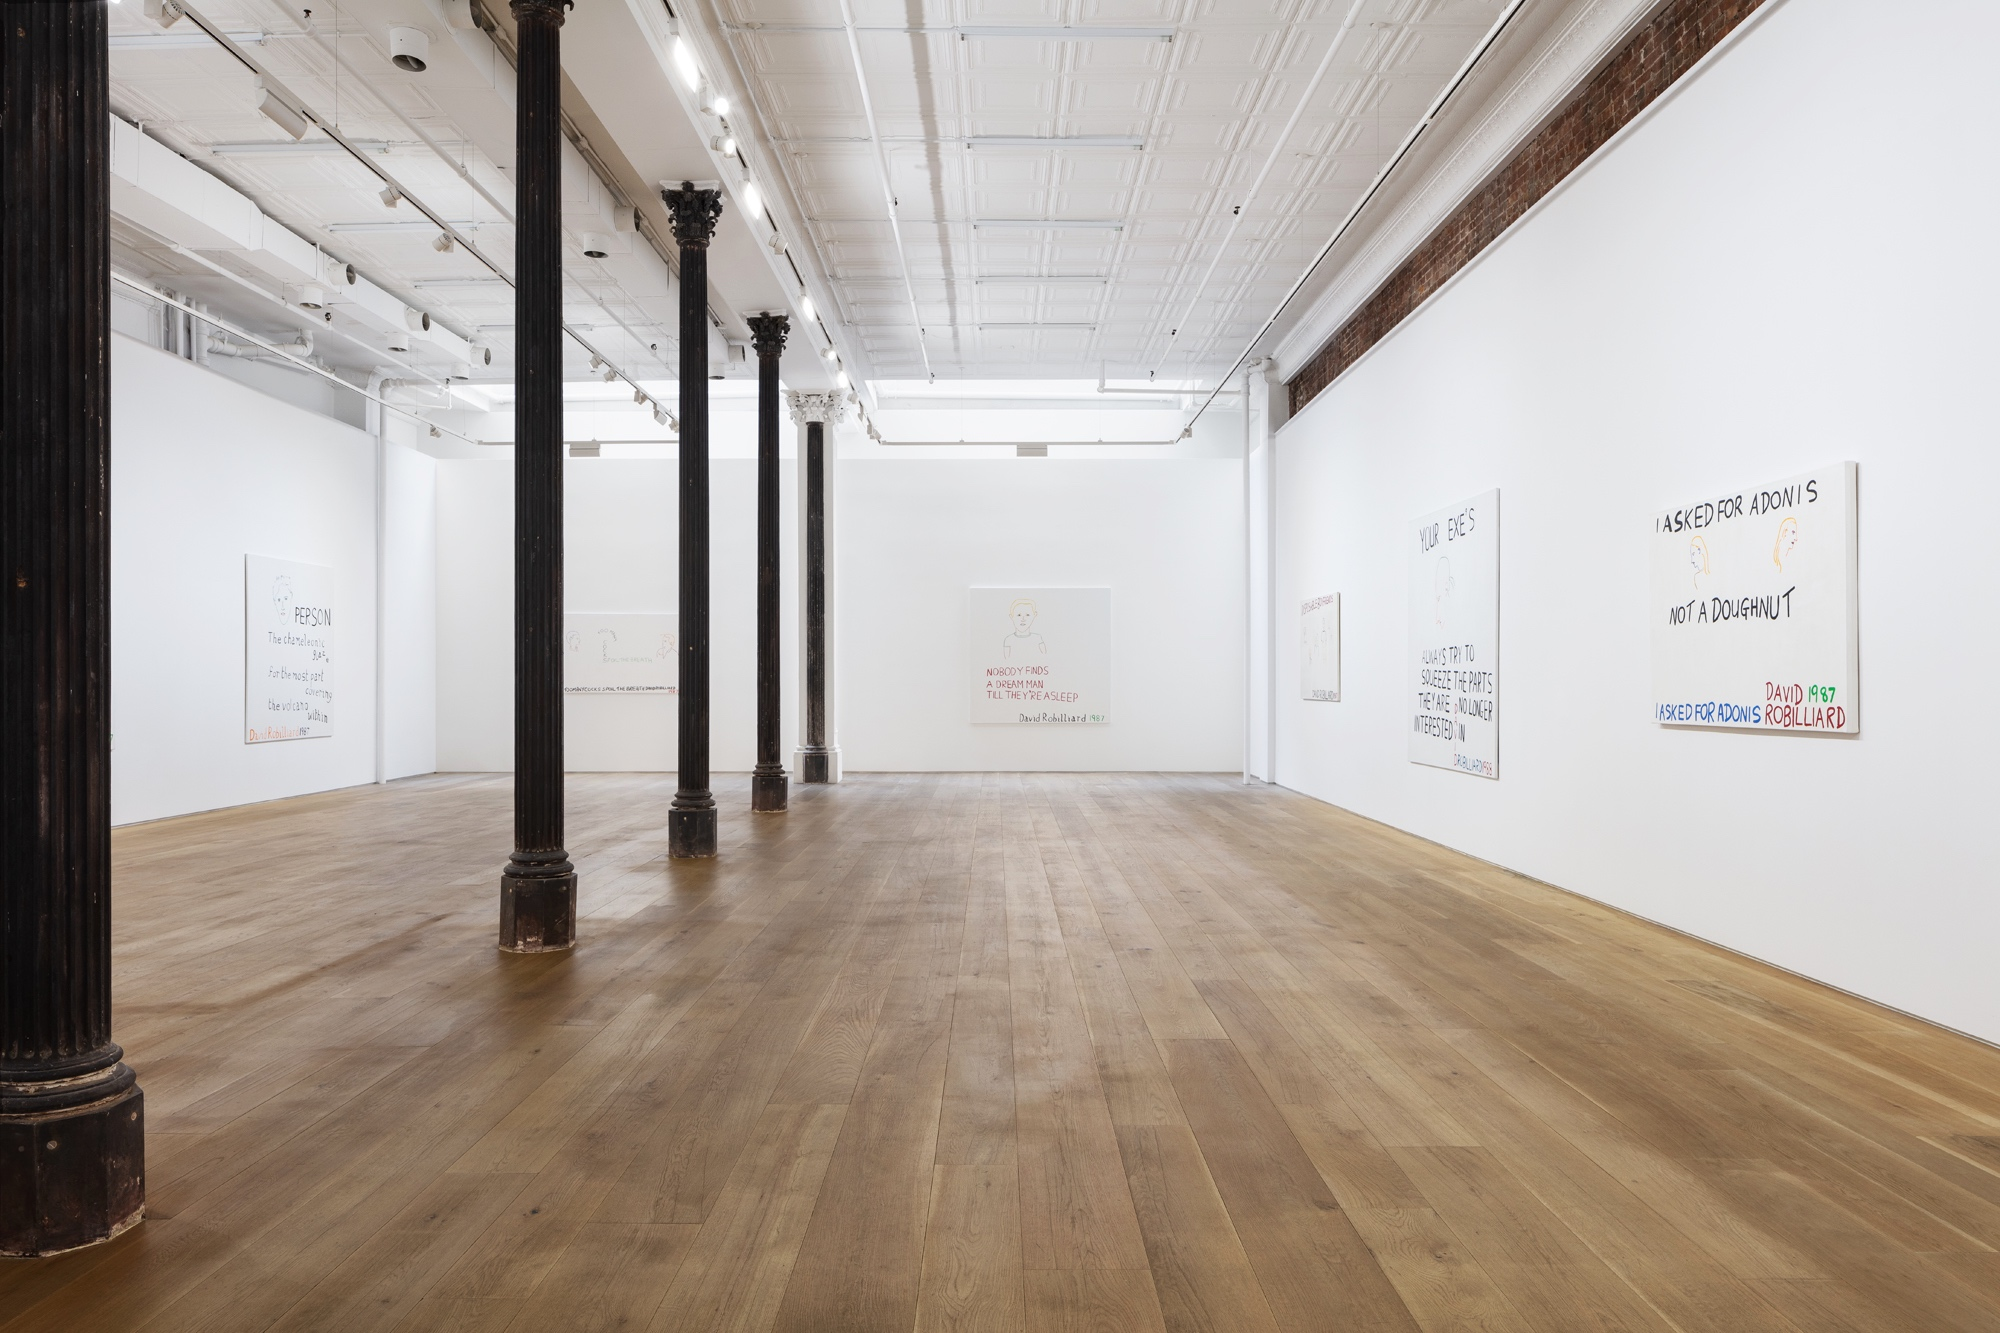 DAVID ROBILLIARD Works 1984-1988 Ortuzar Projects